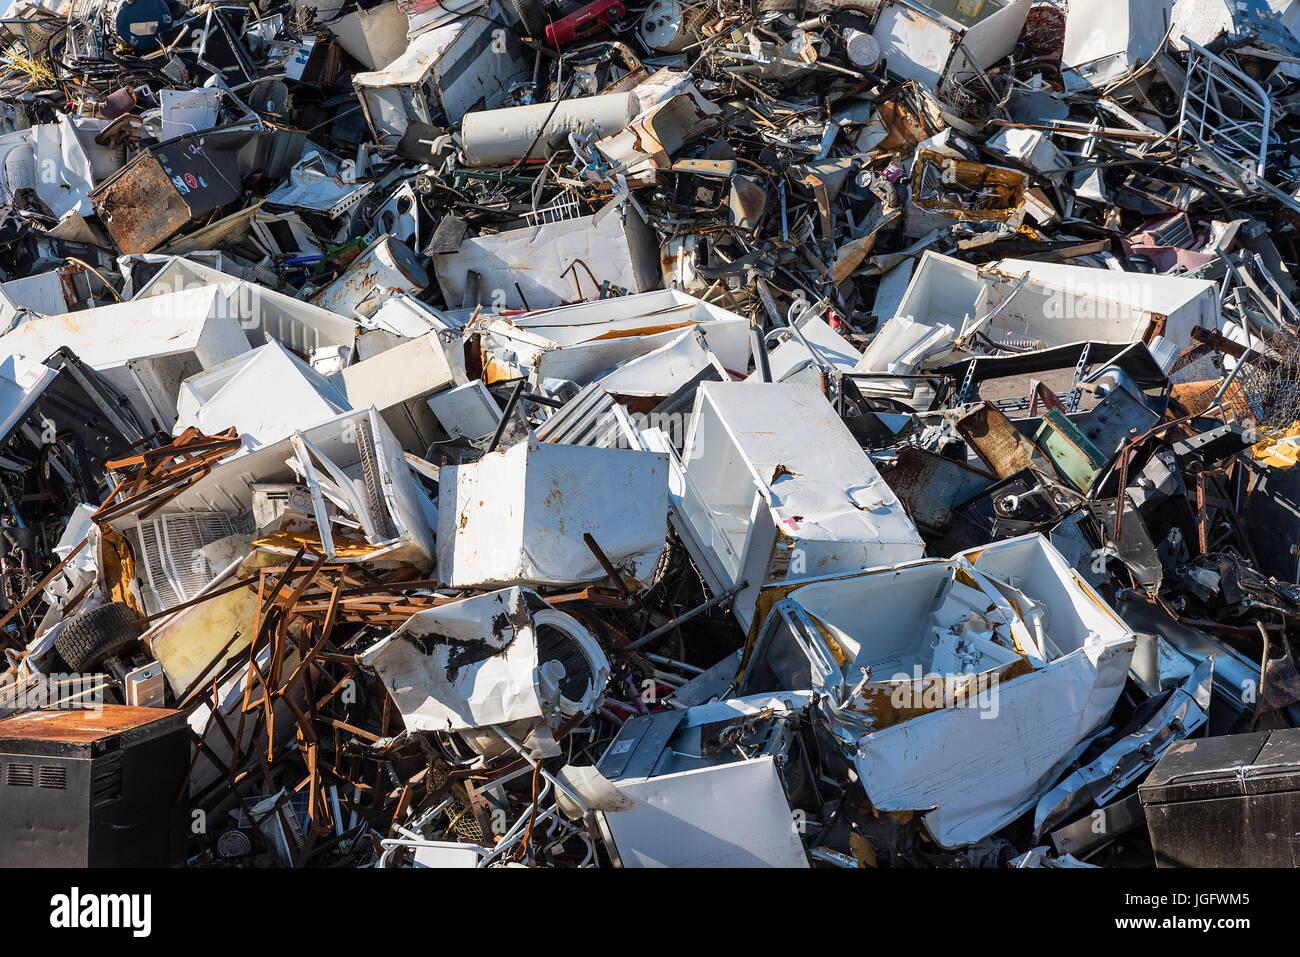 Scrap metal recycling facility. Stock Photo